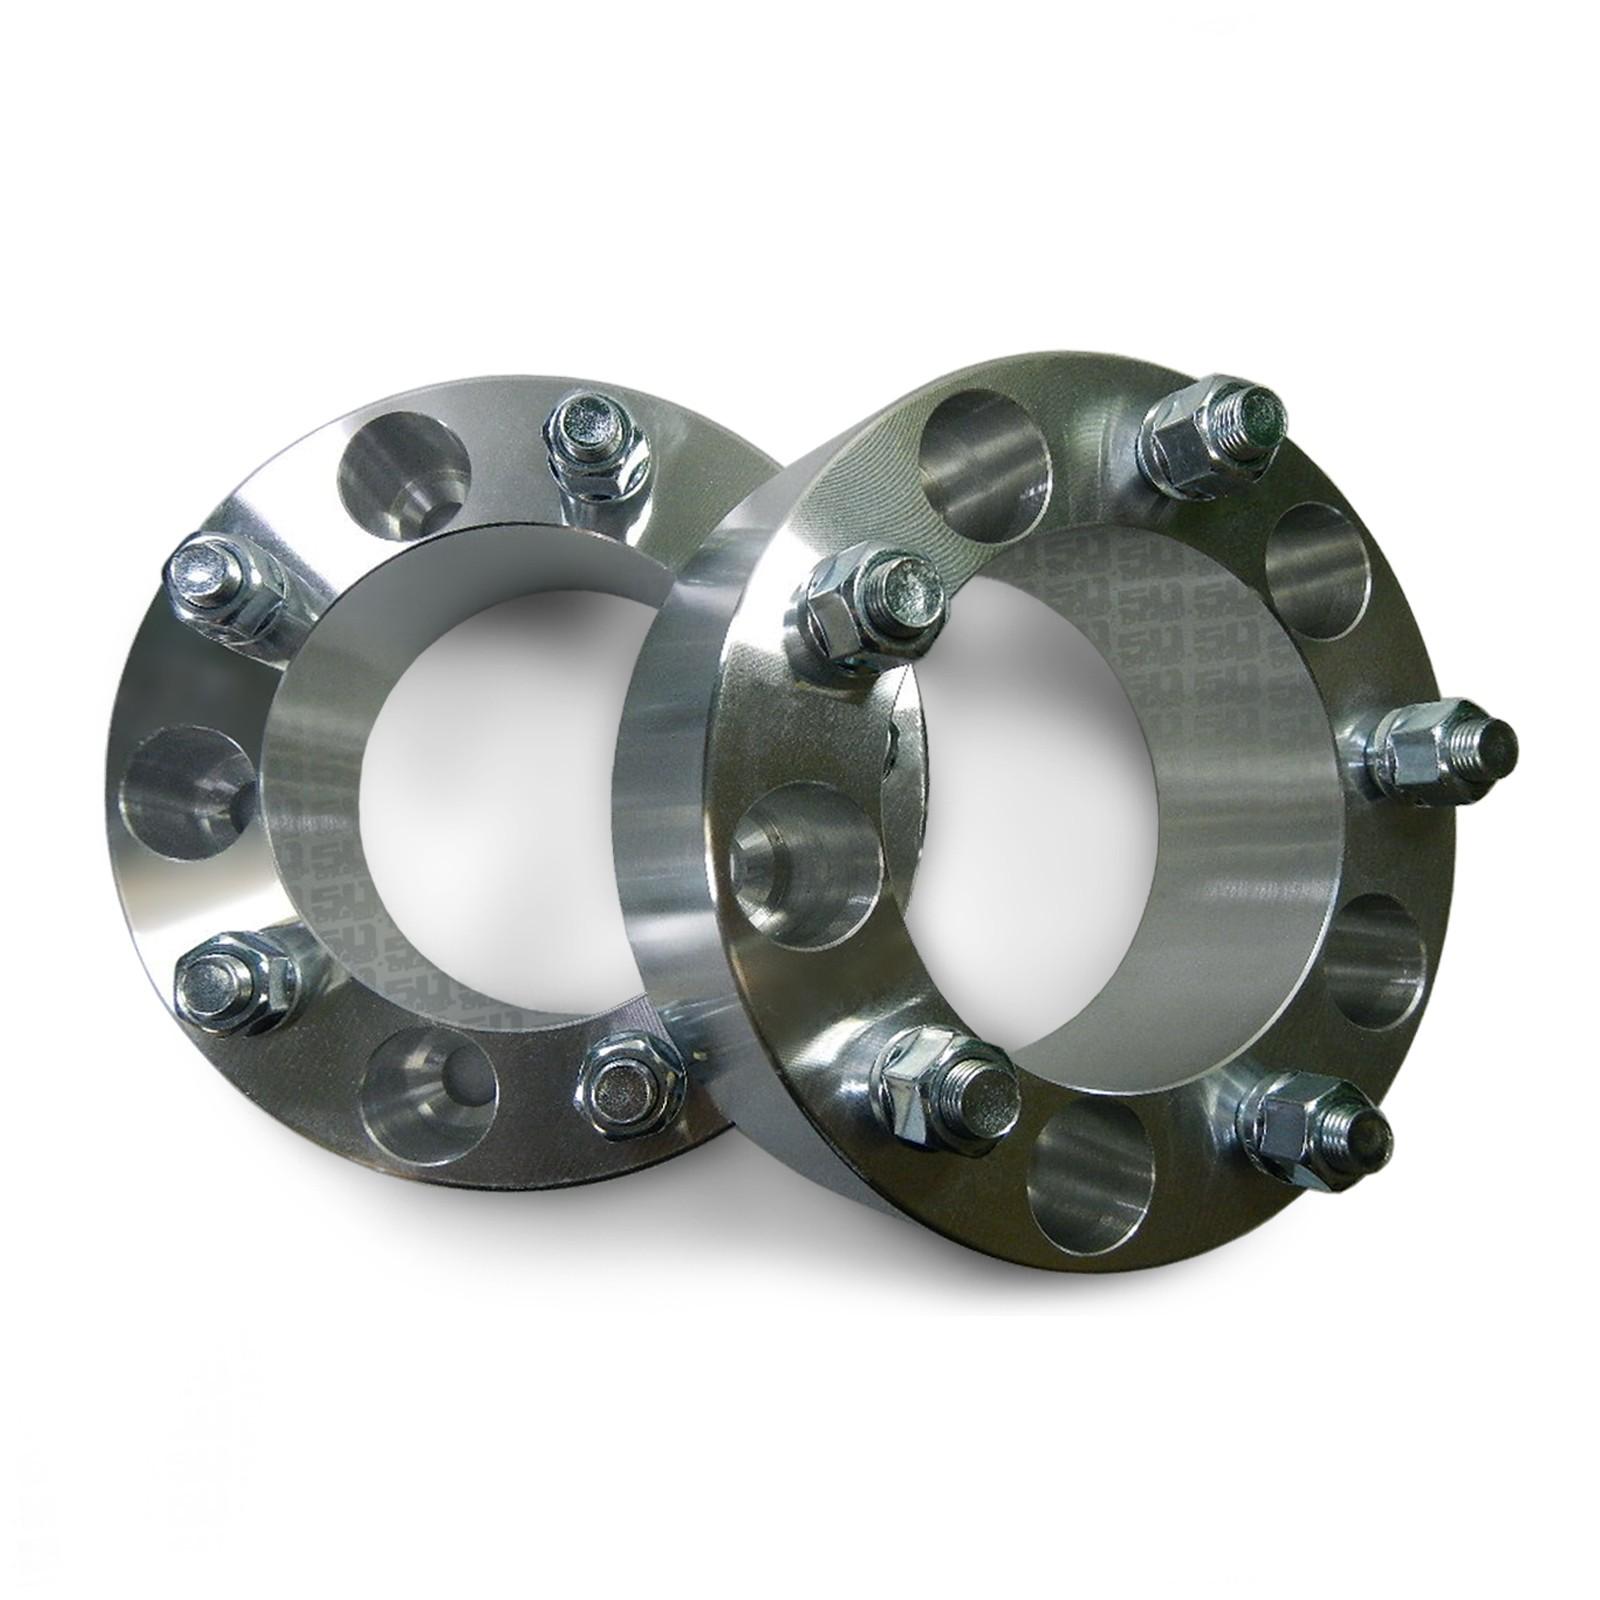 50 Caliber Racing 5x150mm 2 inch Aluminum Wheel Spacers